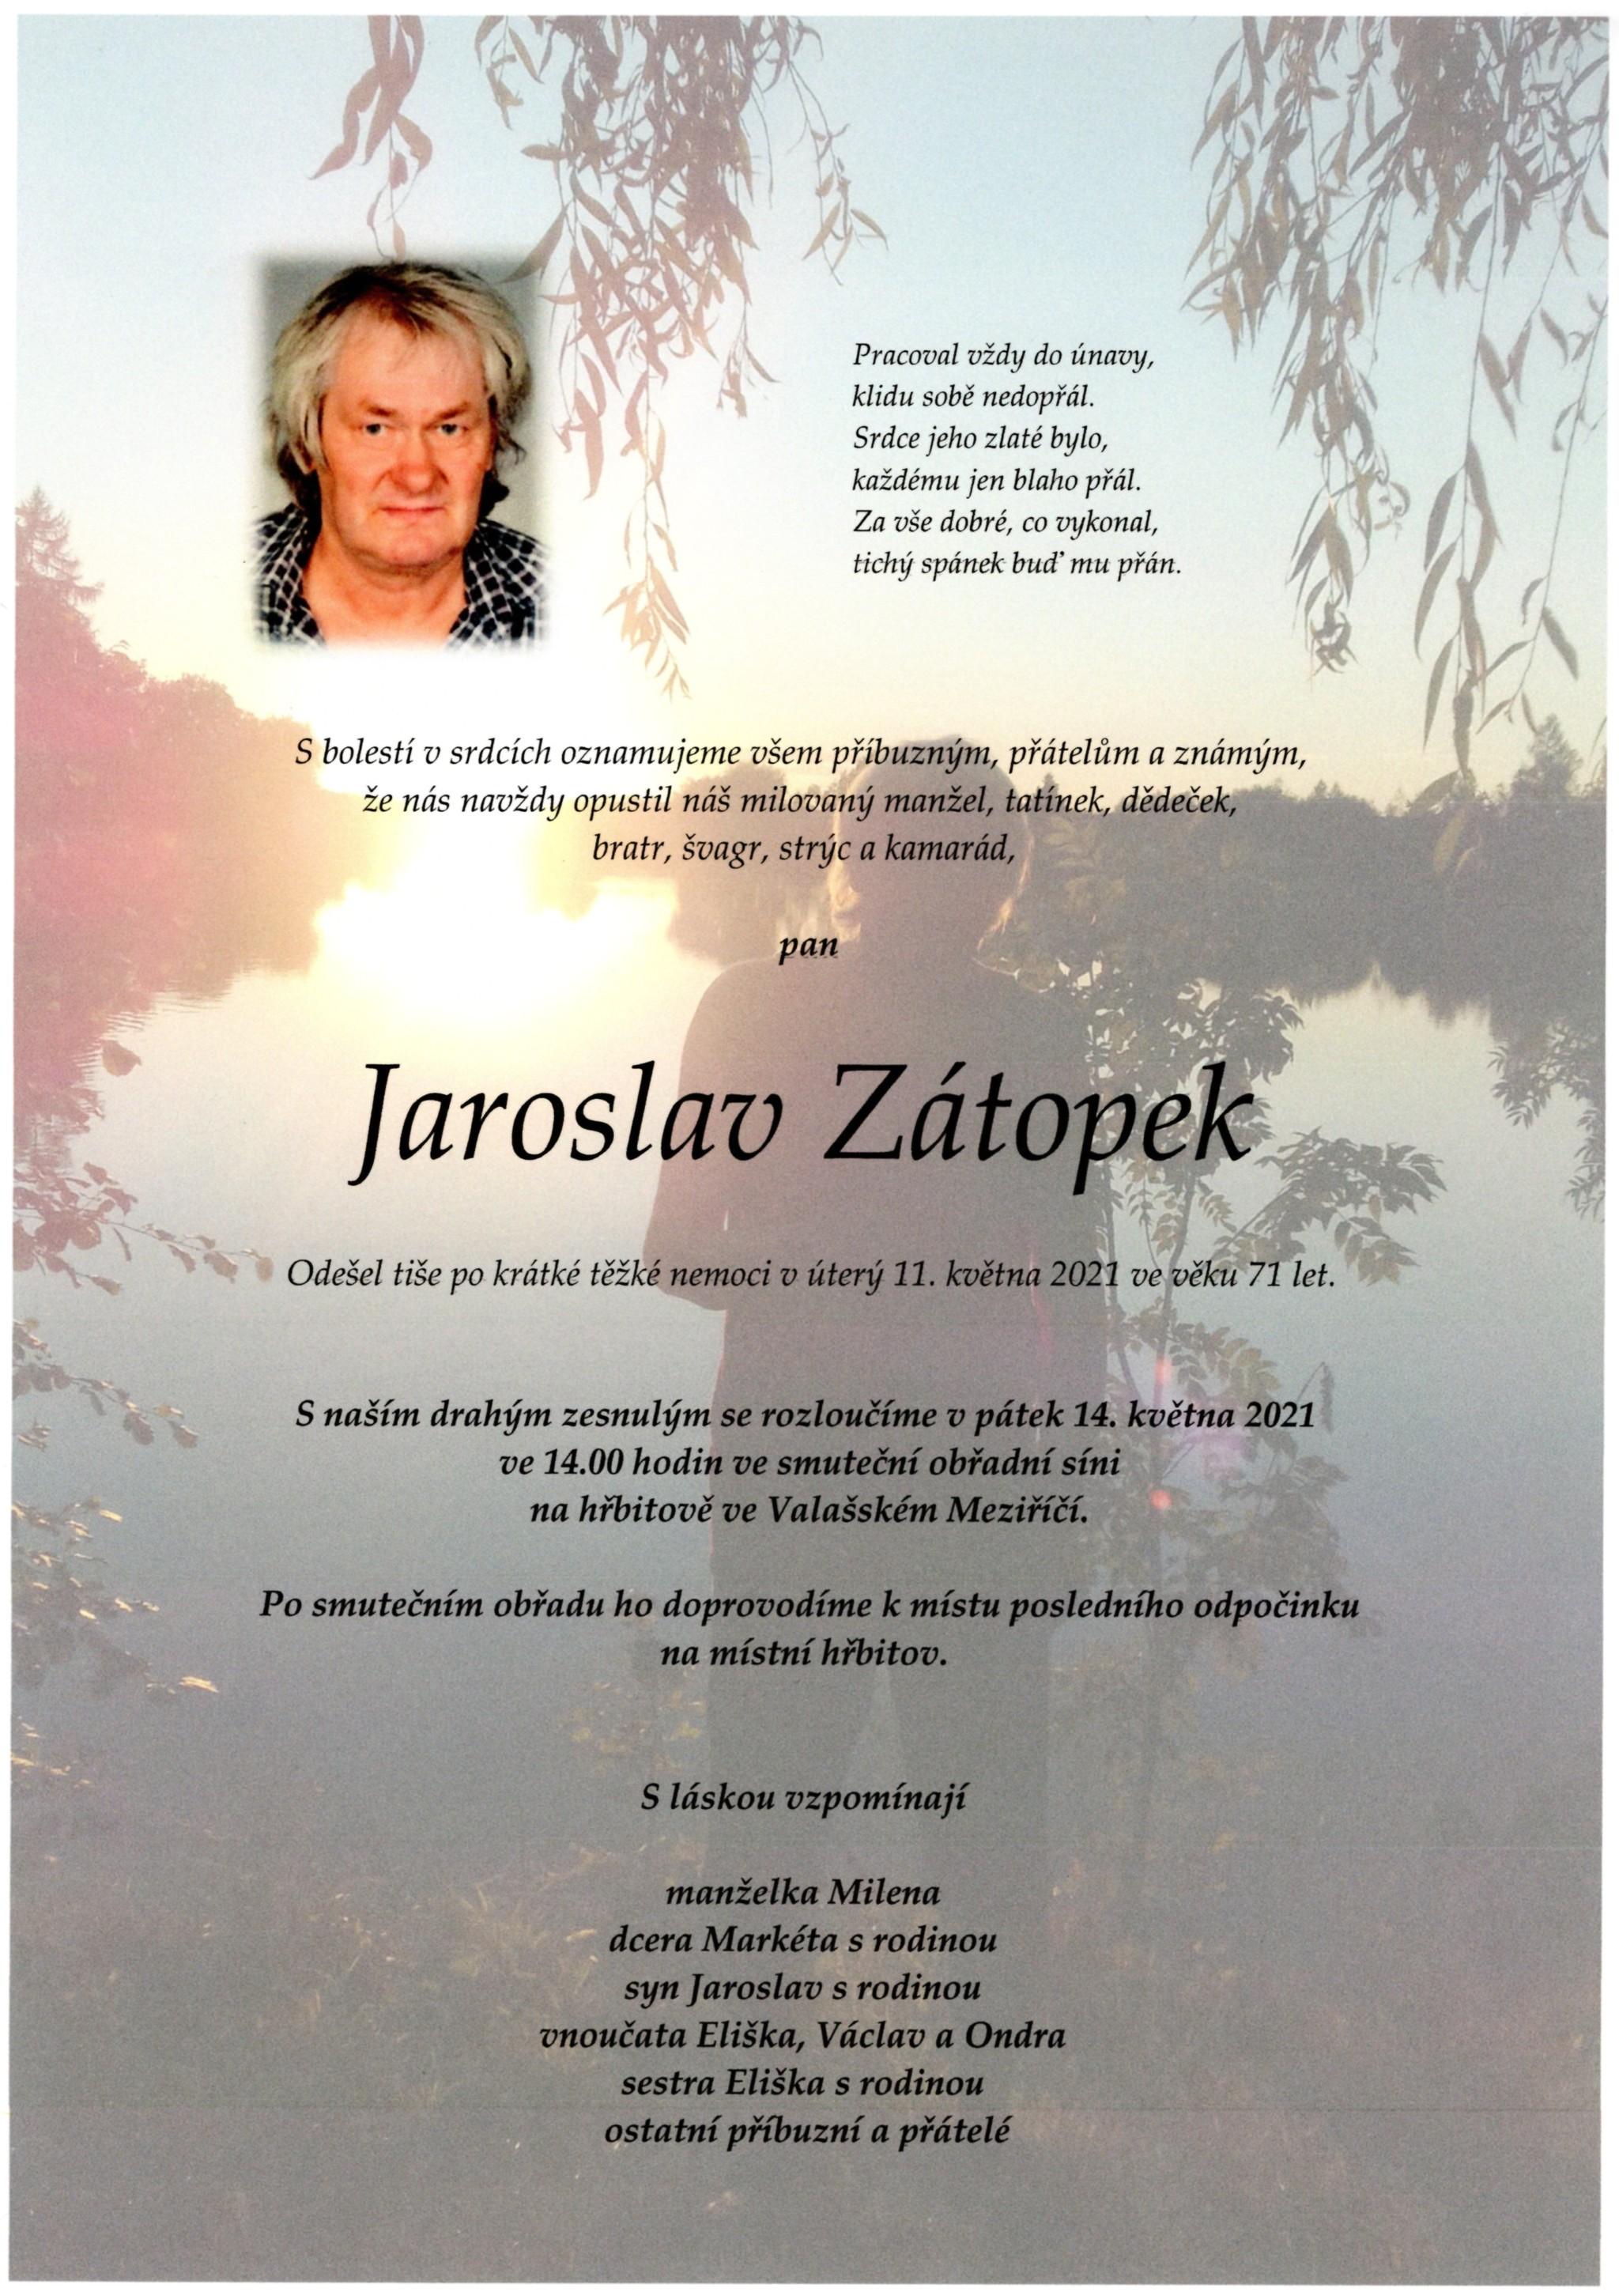 Jaroslav Zátopek